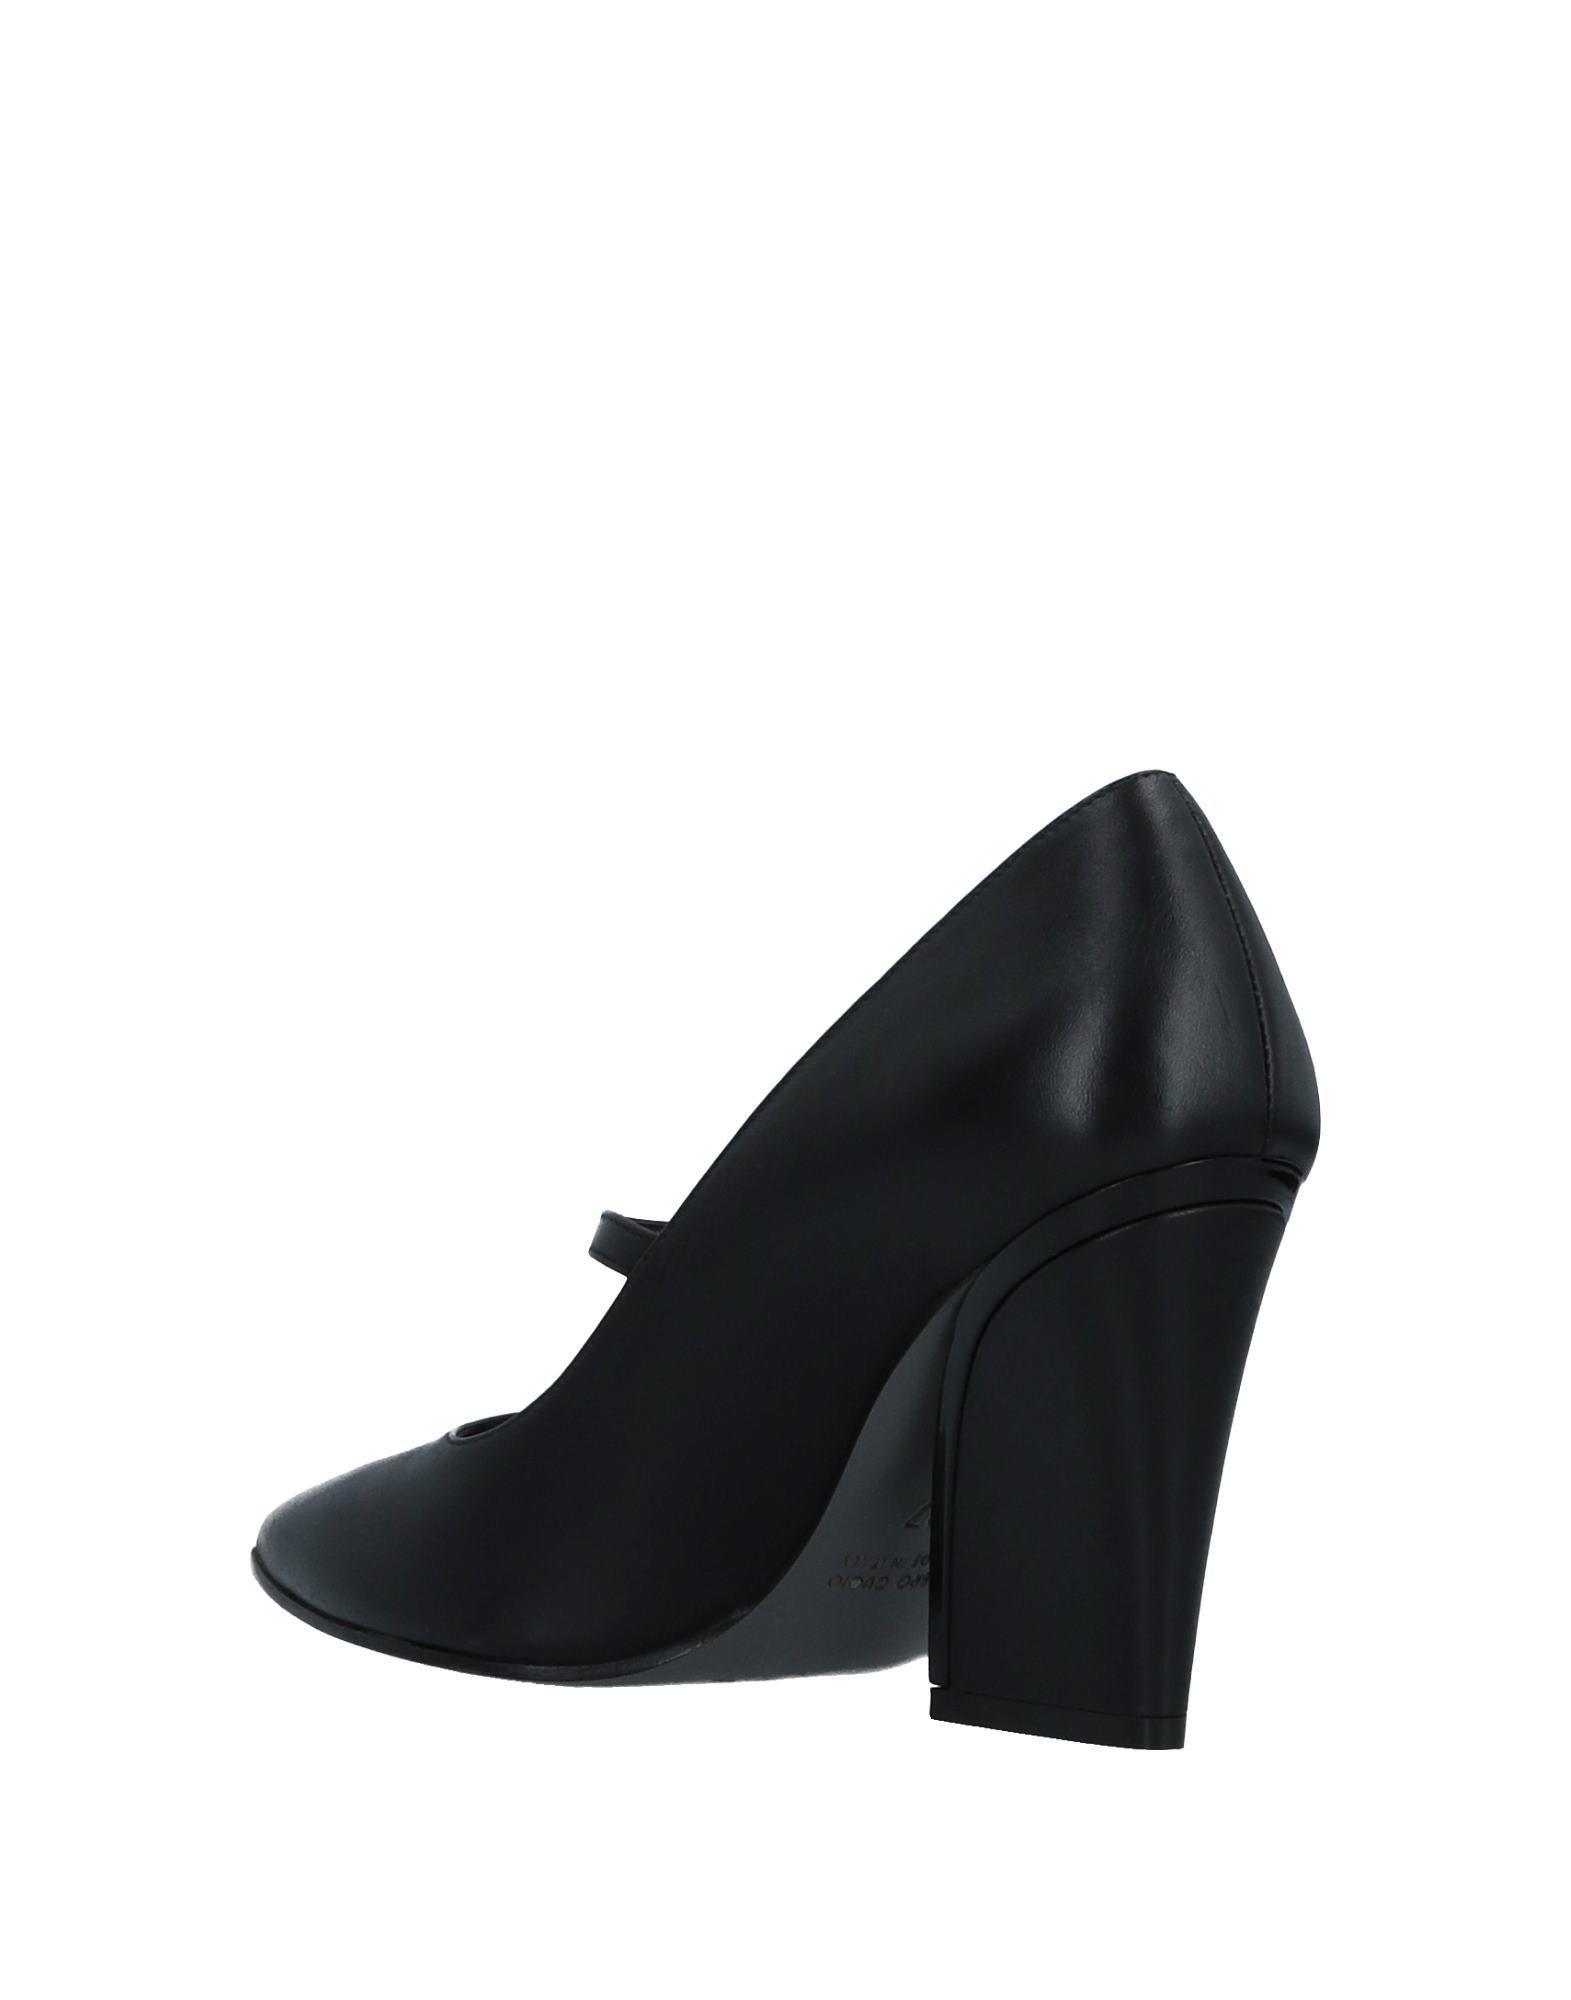 Marc Ellis Gute Pumps Damen  11516355SC Gute Ellis Qualität beliebte Schuhe 9a4827